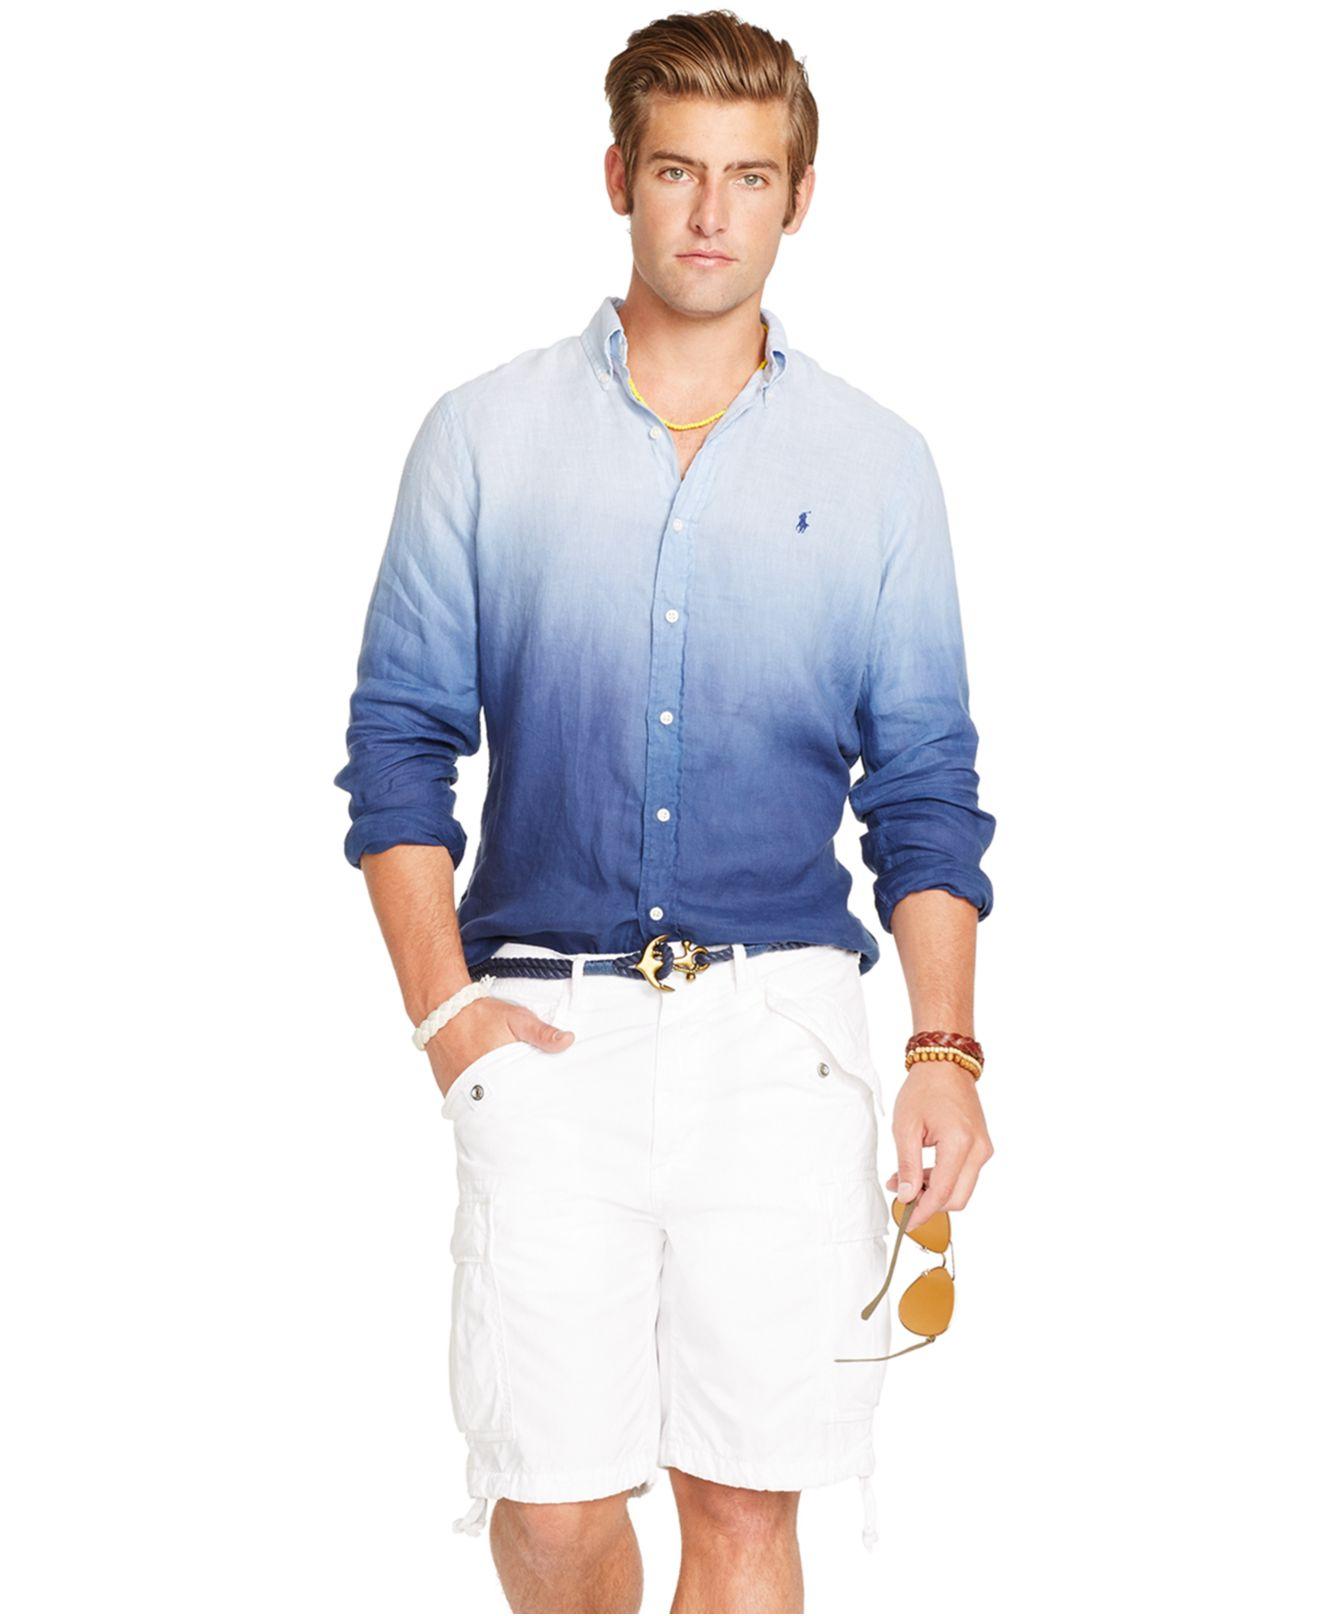 62f9eb231657 ... where can i buy polo ralph lauren mens linen button down shirt aef73  07fd7